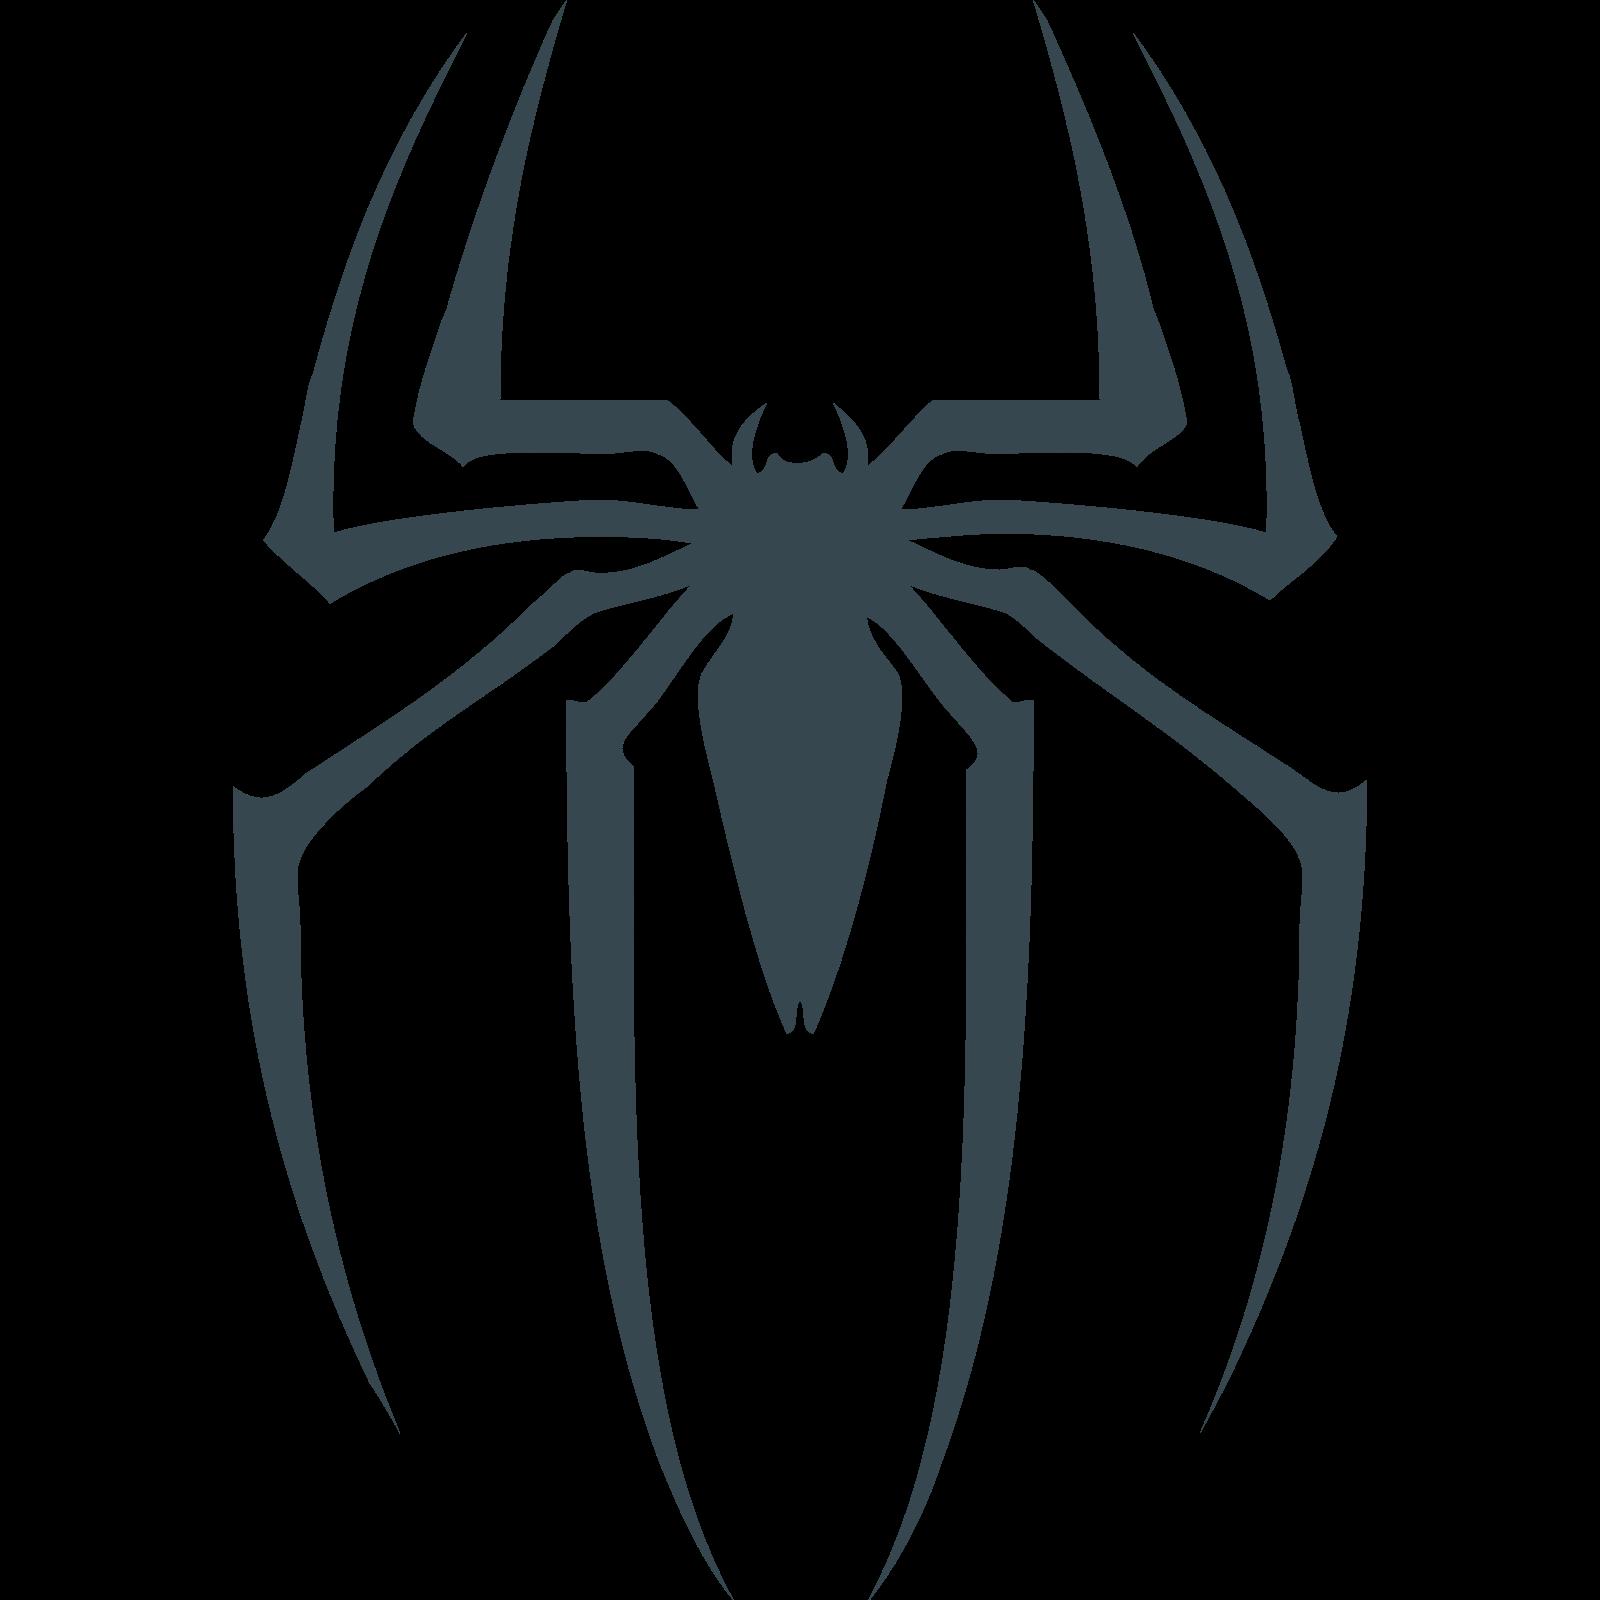 Nowy Spider-Man icon